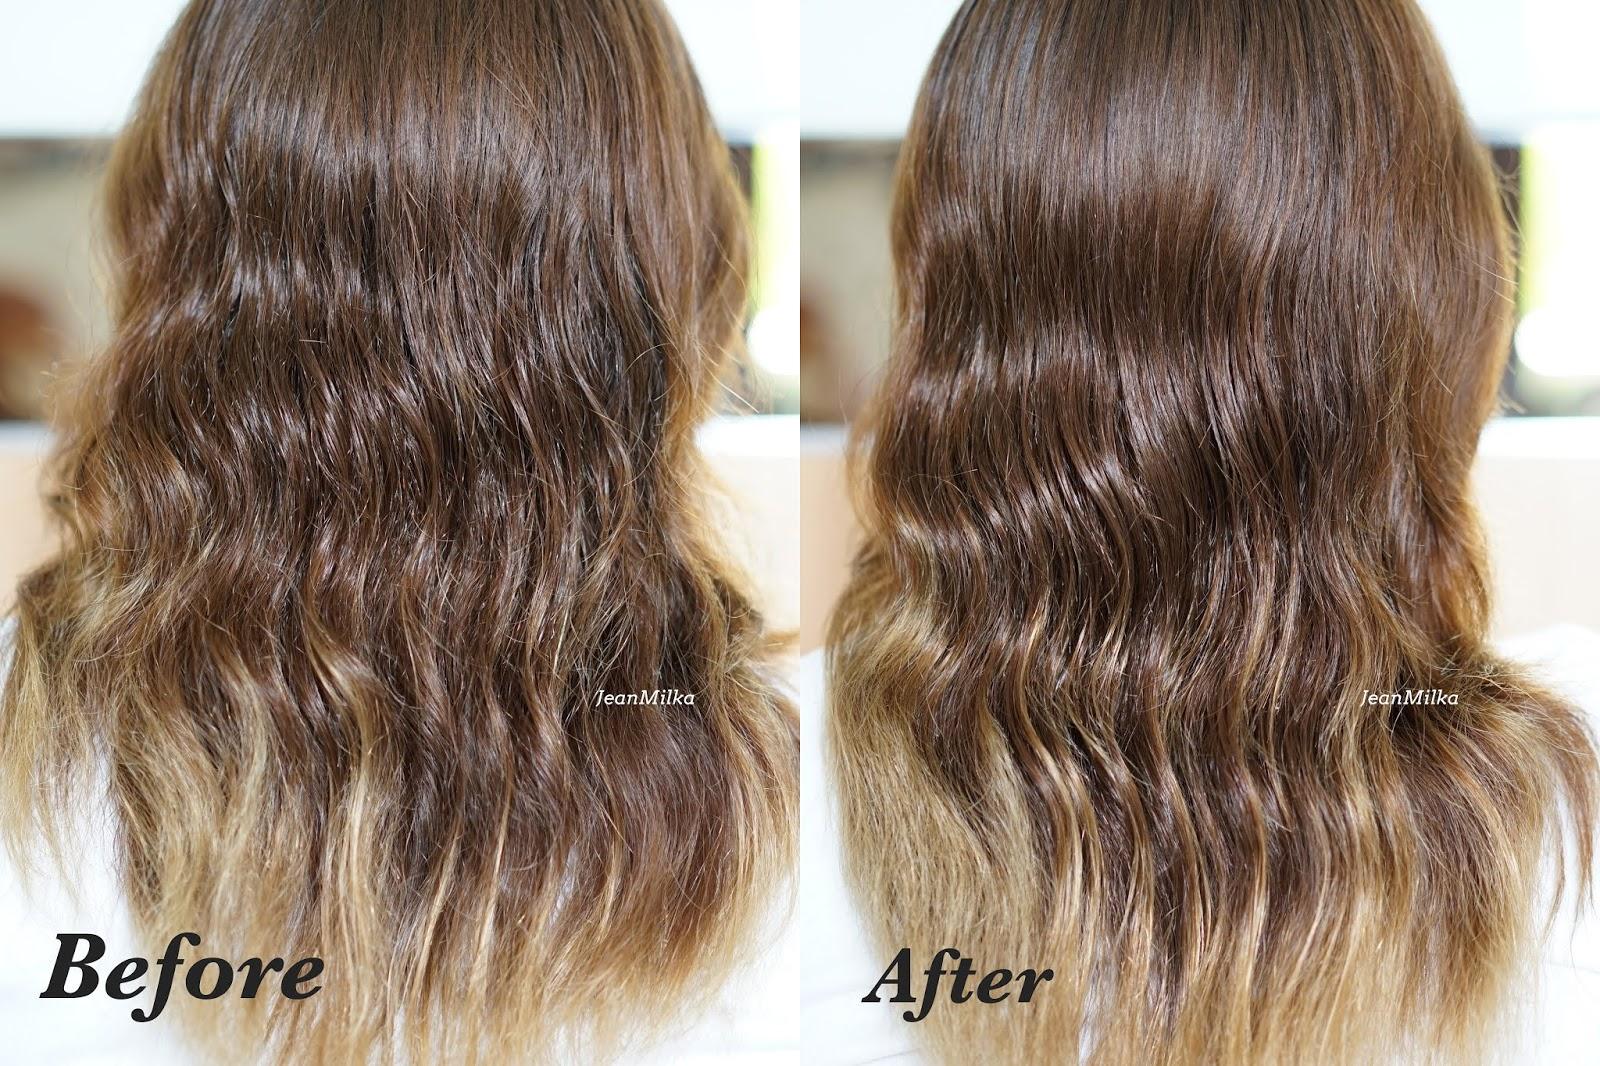 Rambut Sehat Lembab Dan Lembut Dengan Ellips Hair Vitamin Pro Keratin Review Jean Milka